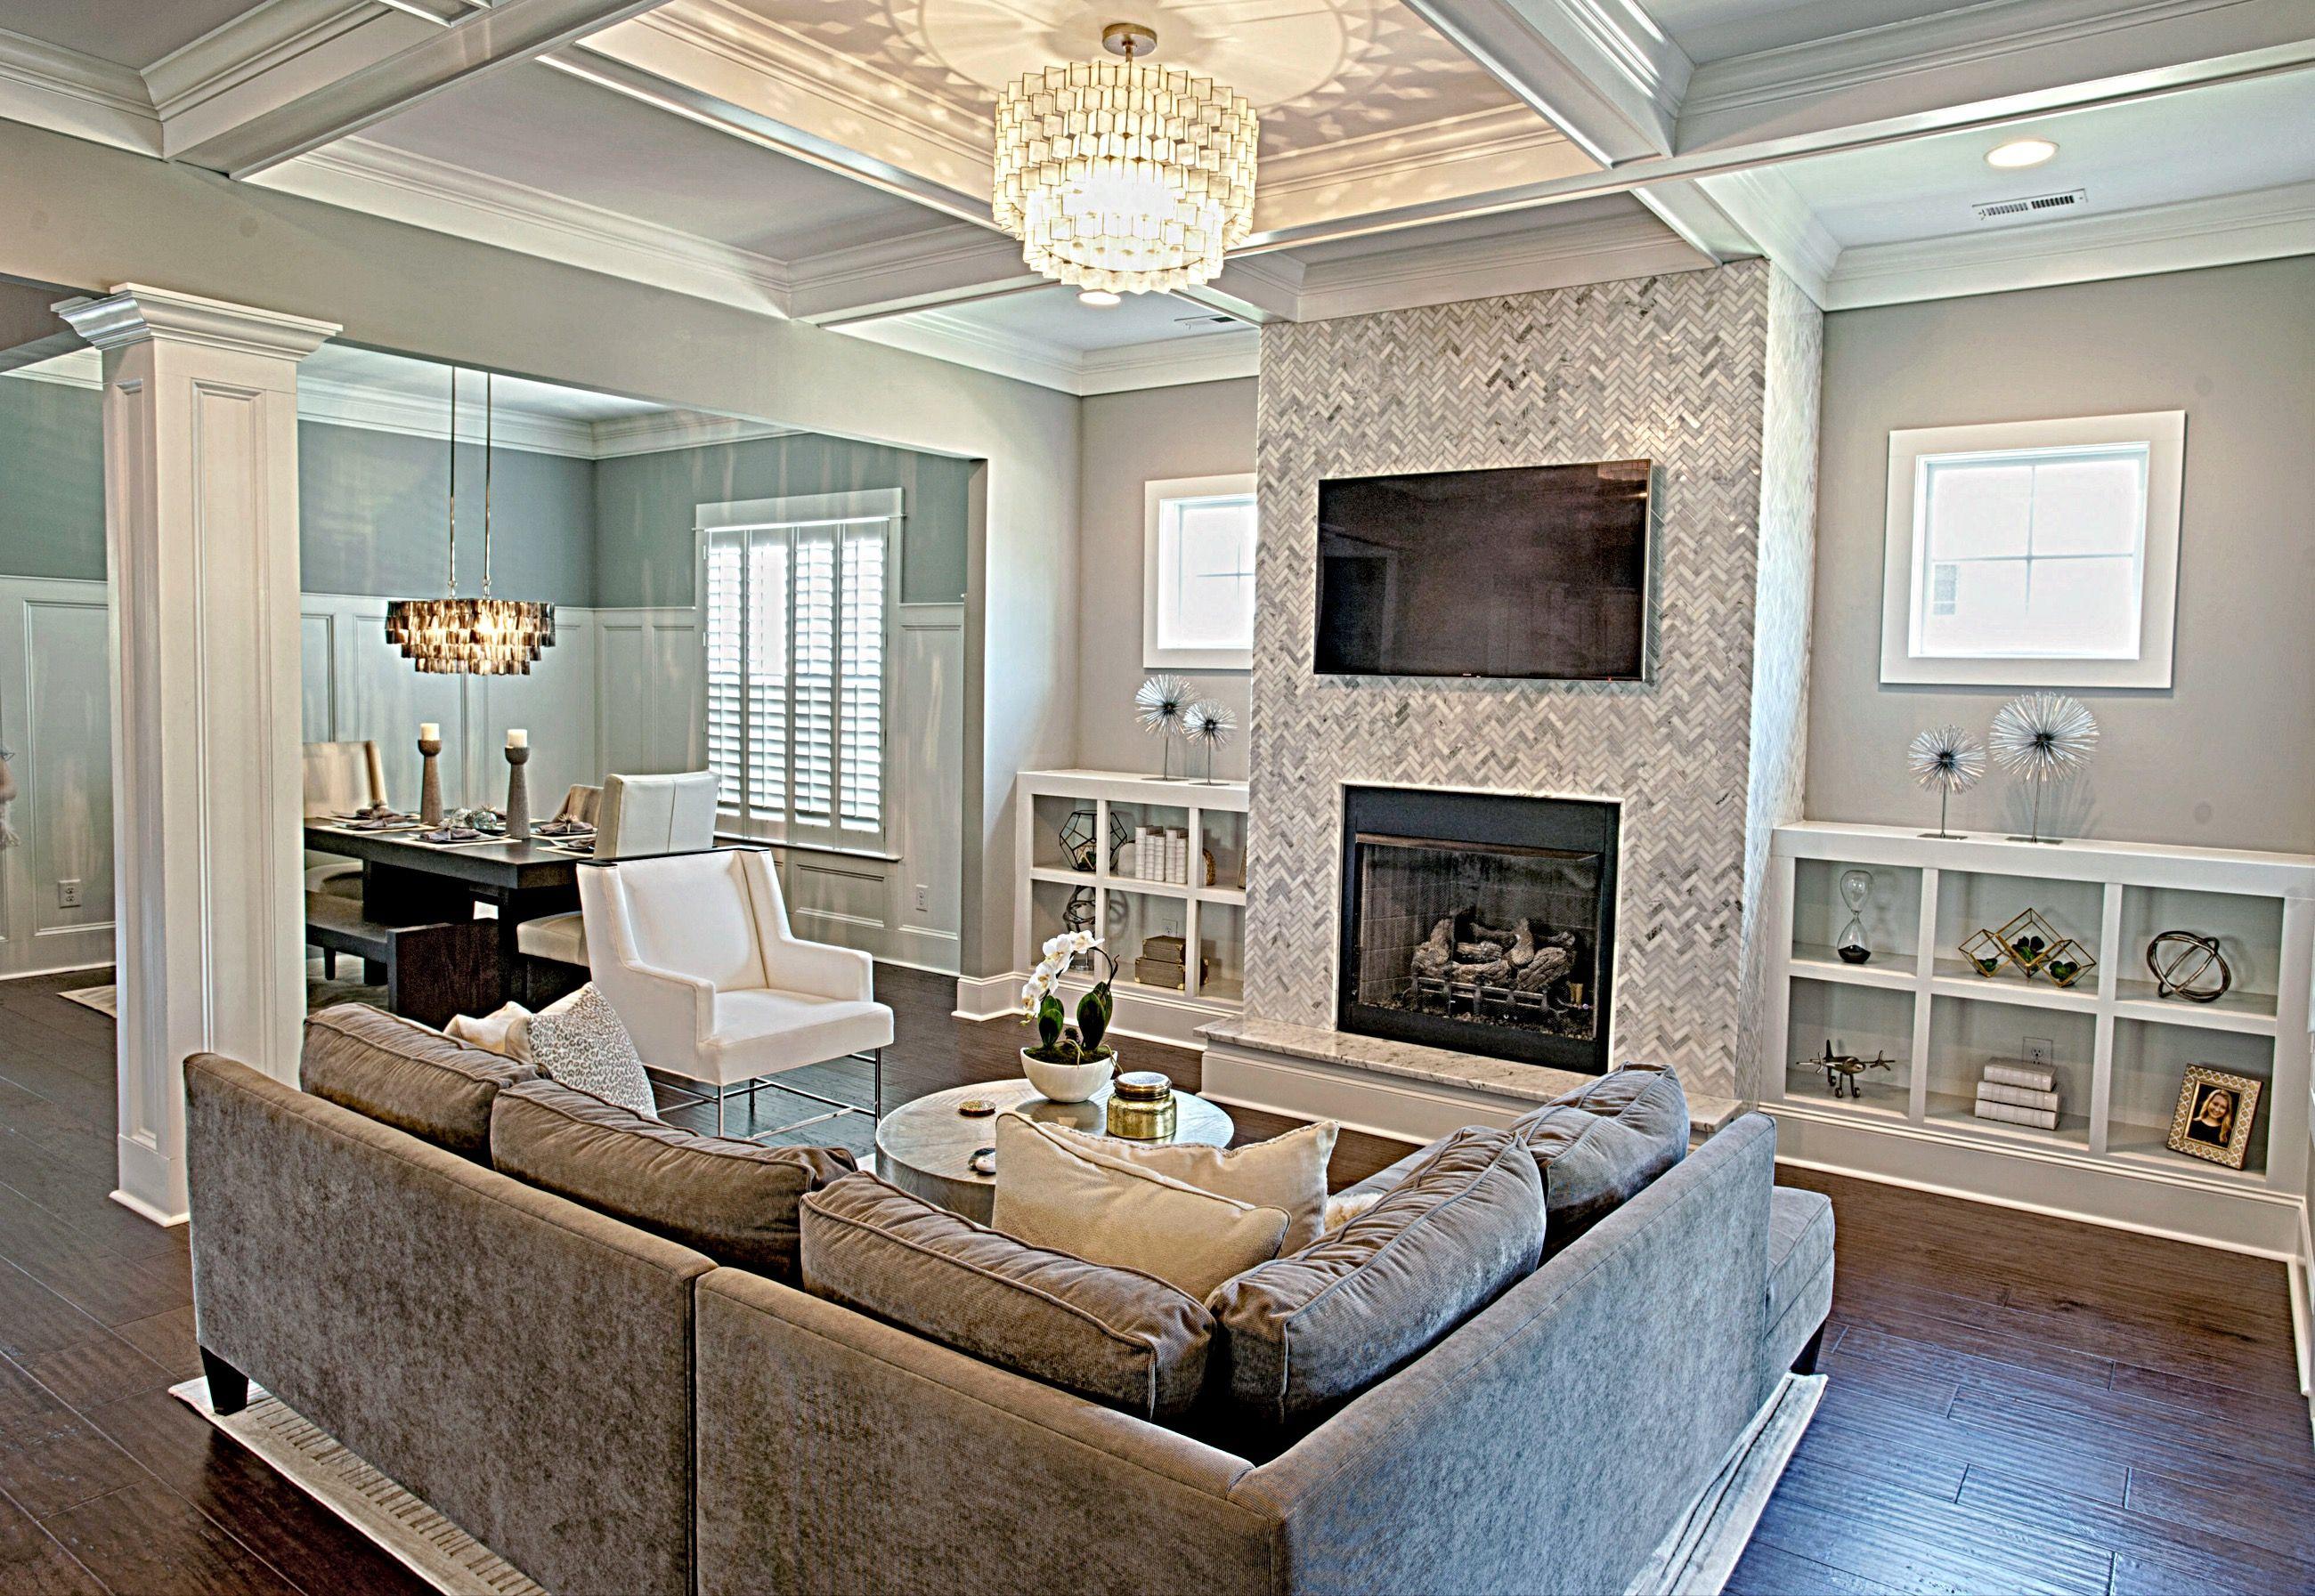 Marble Herringbone Tiled Fireplace Benjamin Moore Coventry Gray Tile